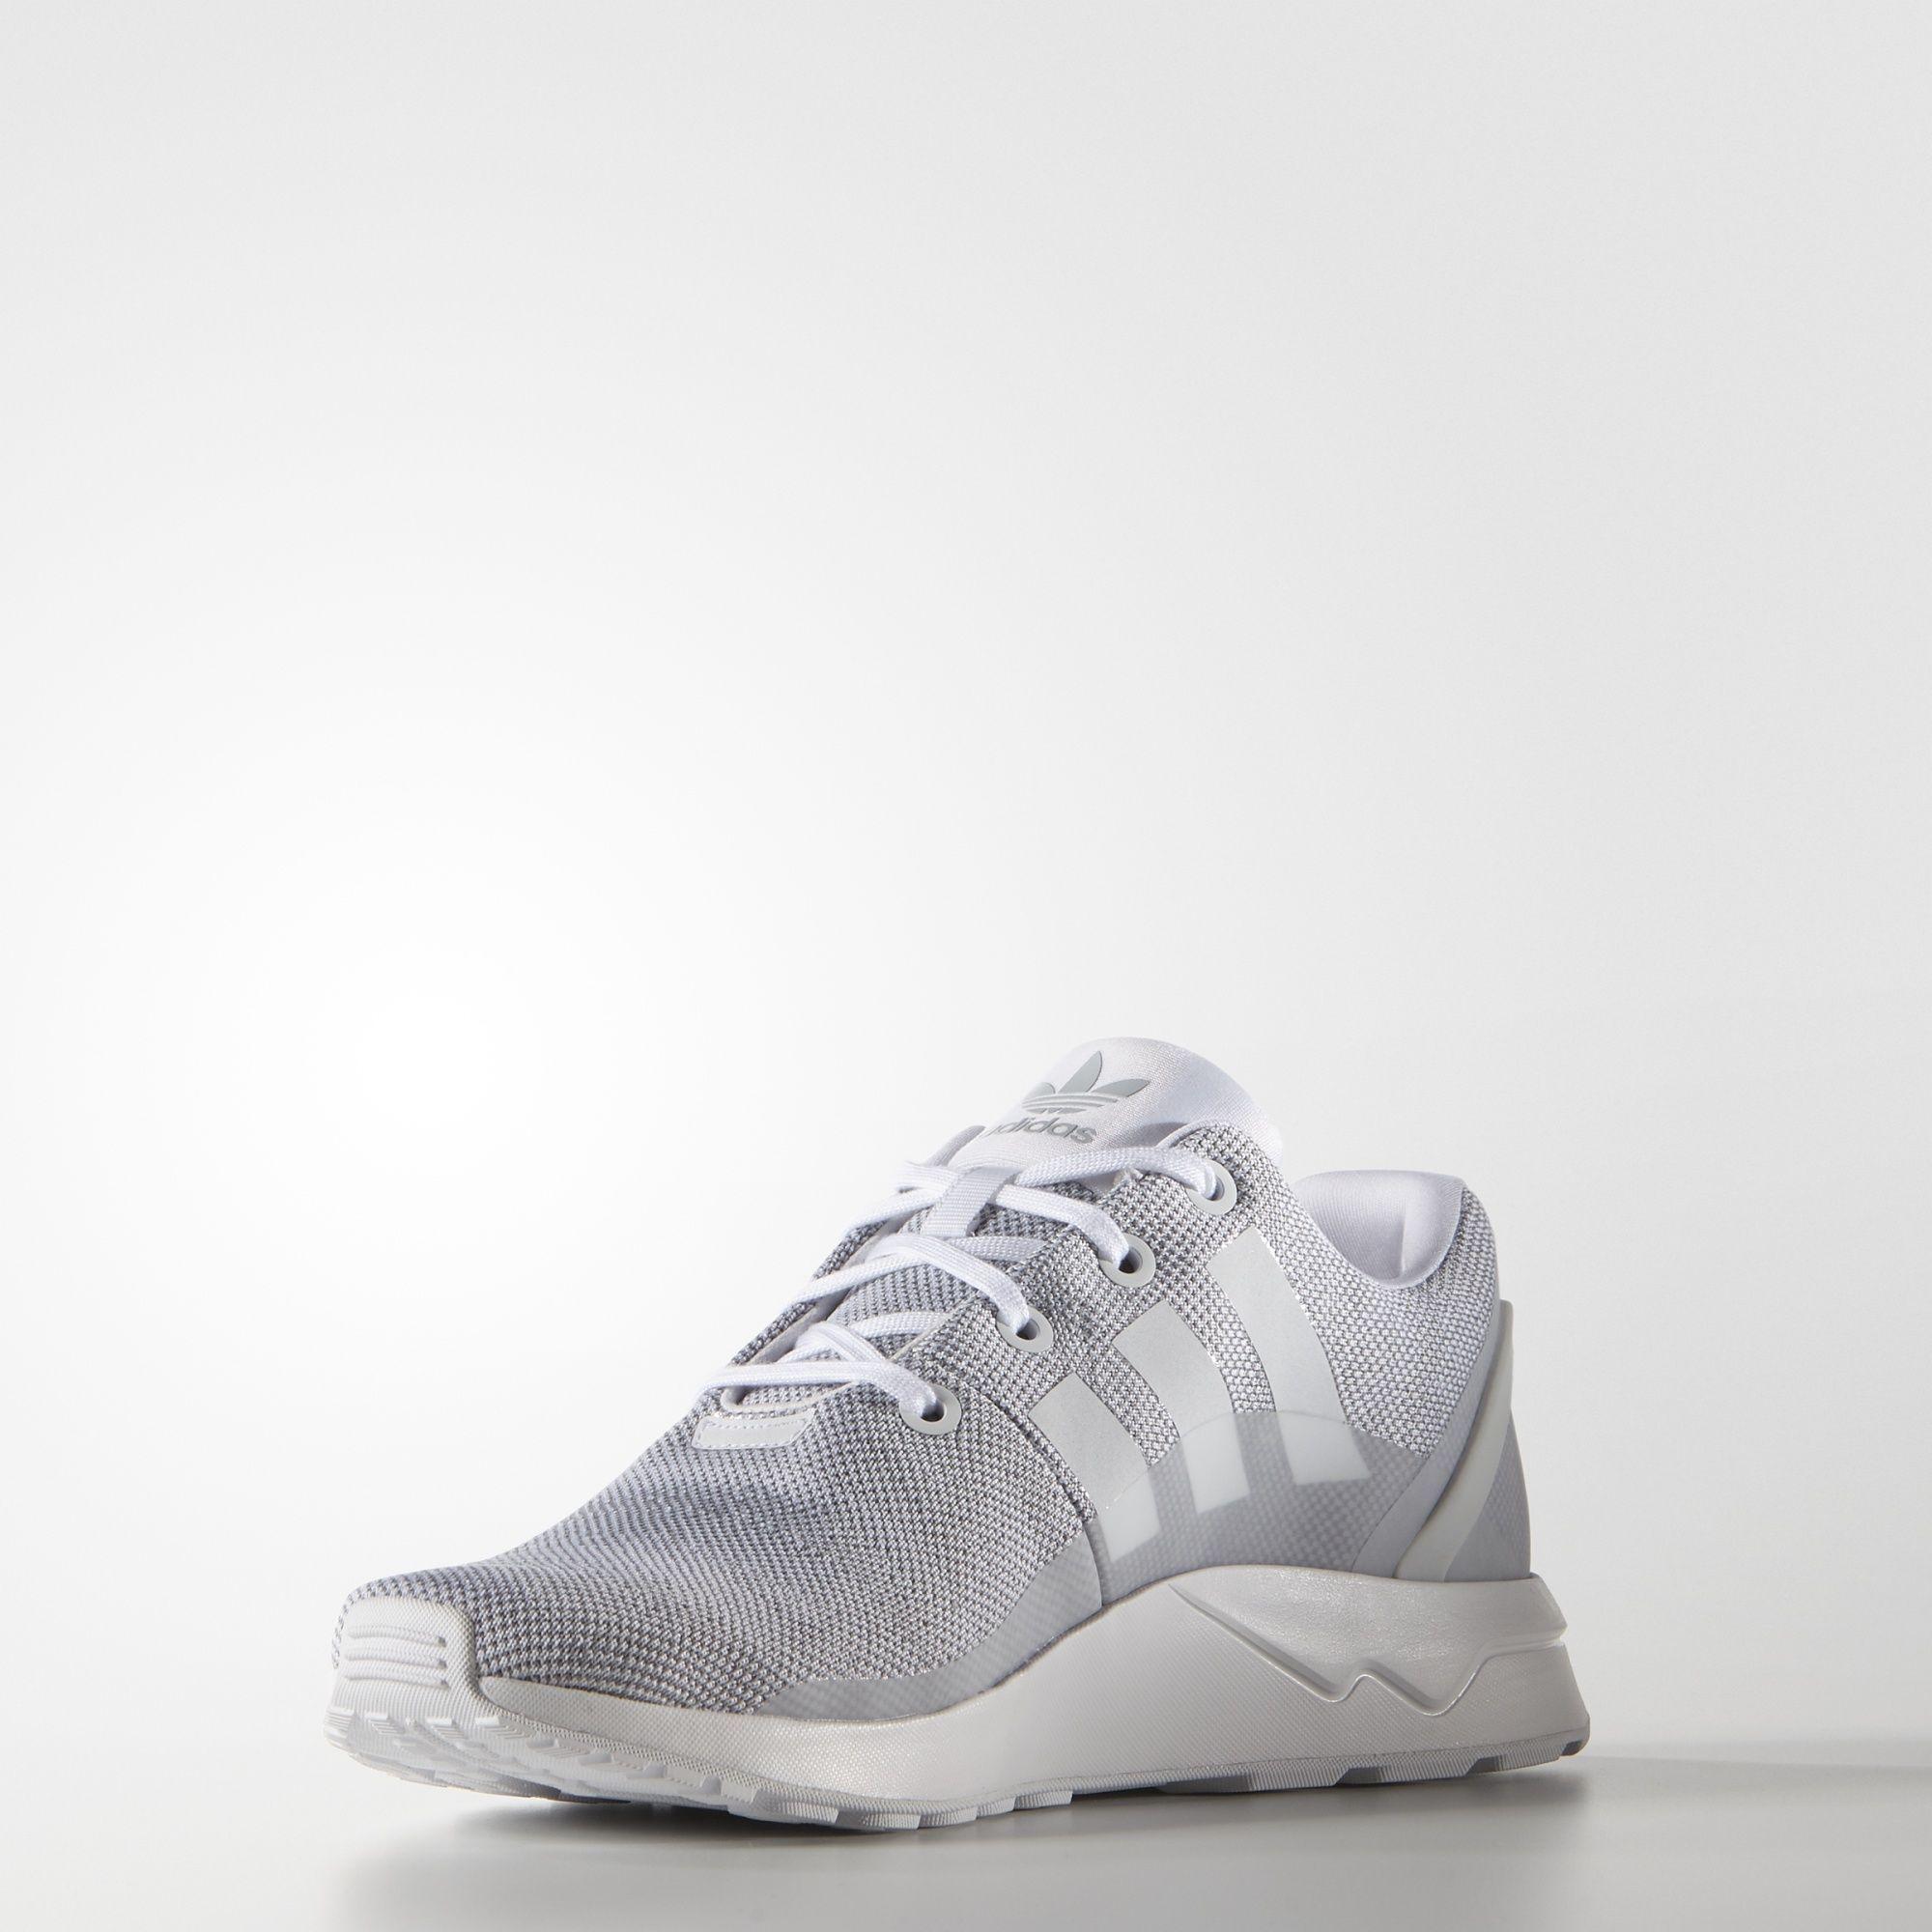 Adidas T Sapatos Ê Nsi Zx Flusso Avanzata Tecnologia Sapatos T Pinterest Zx Flusso 5df0bc